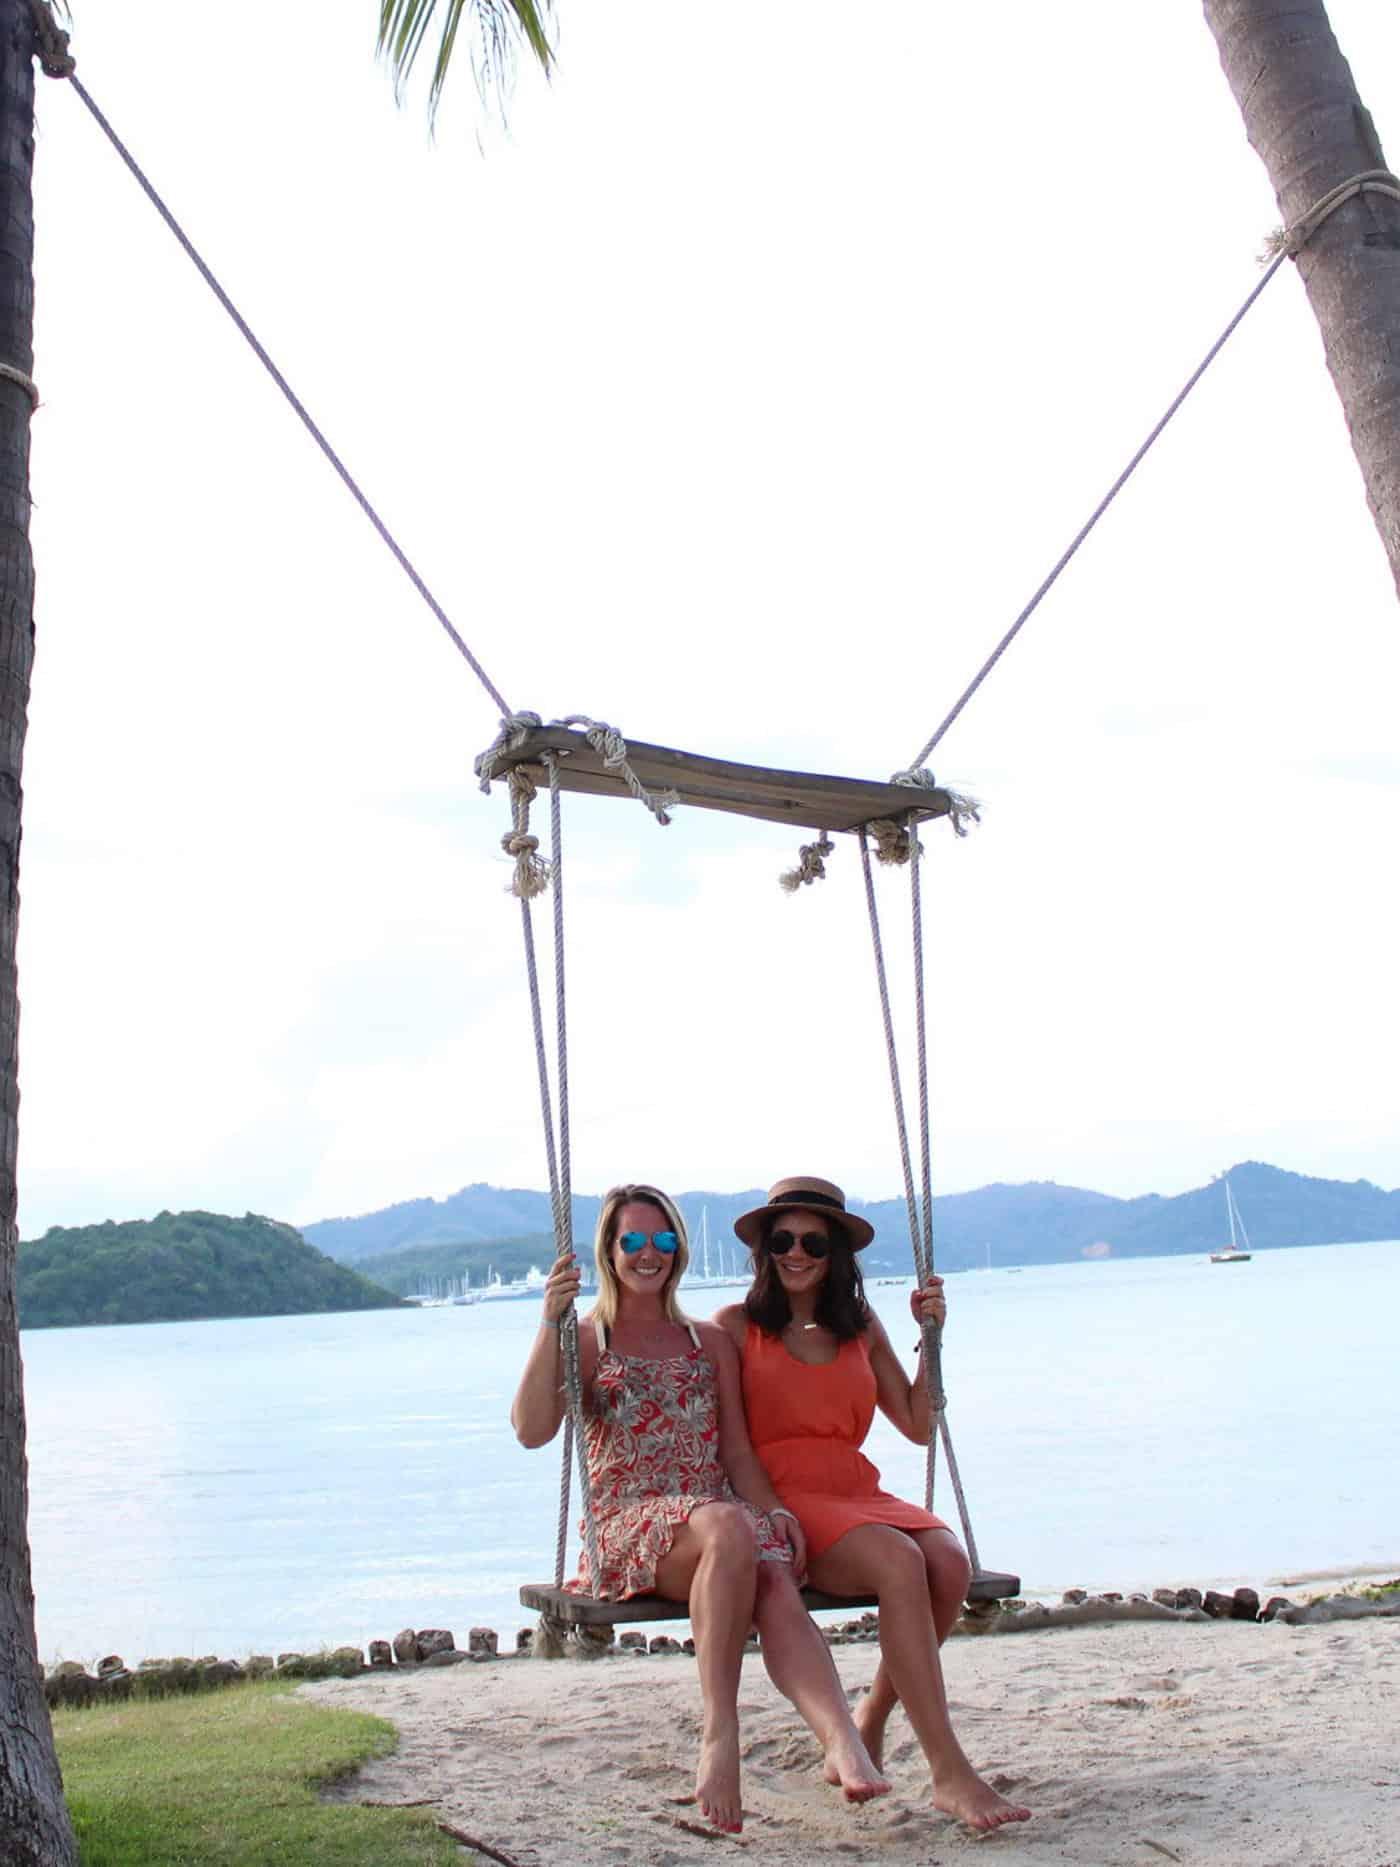 Friends sitting on a swing in Phuket